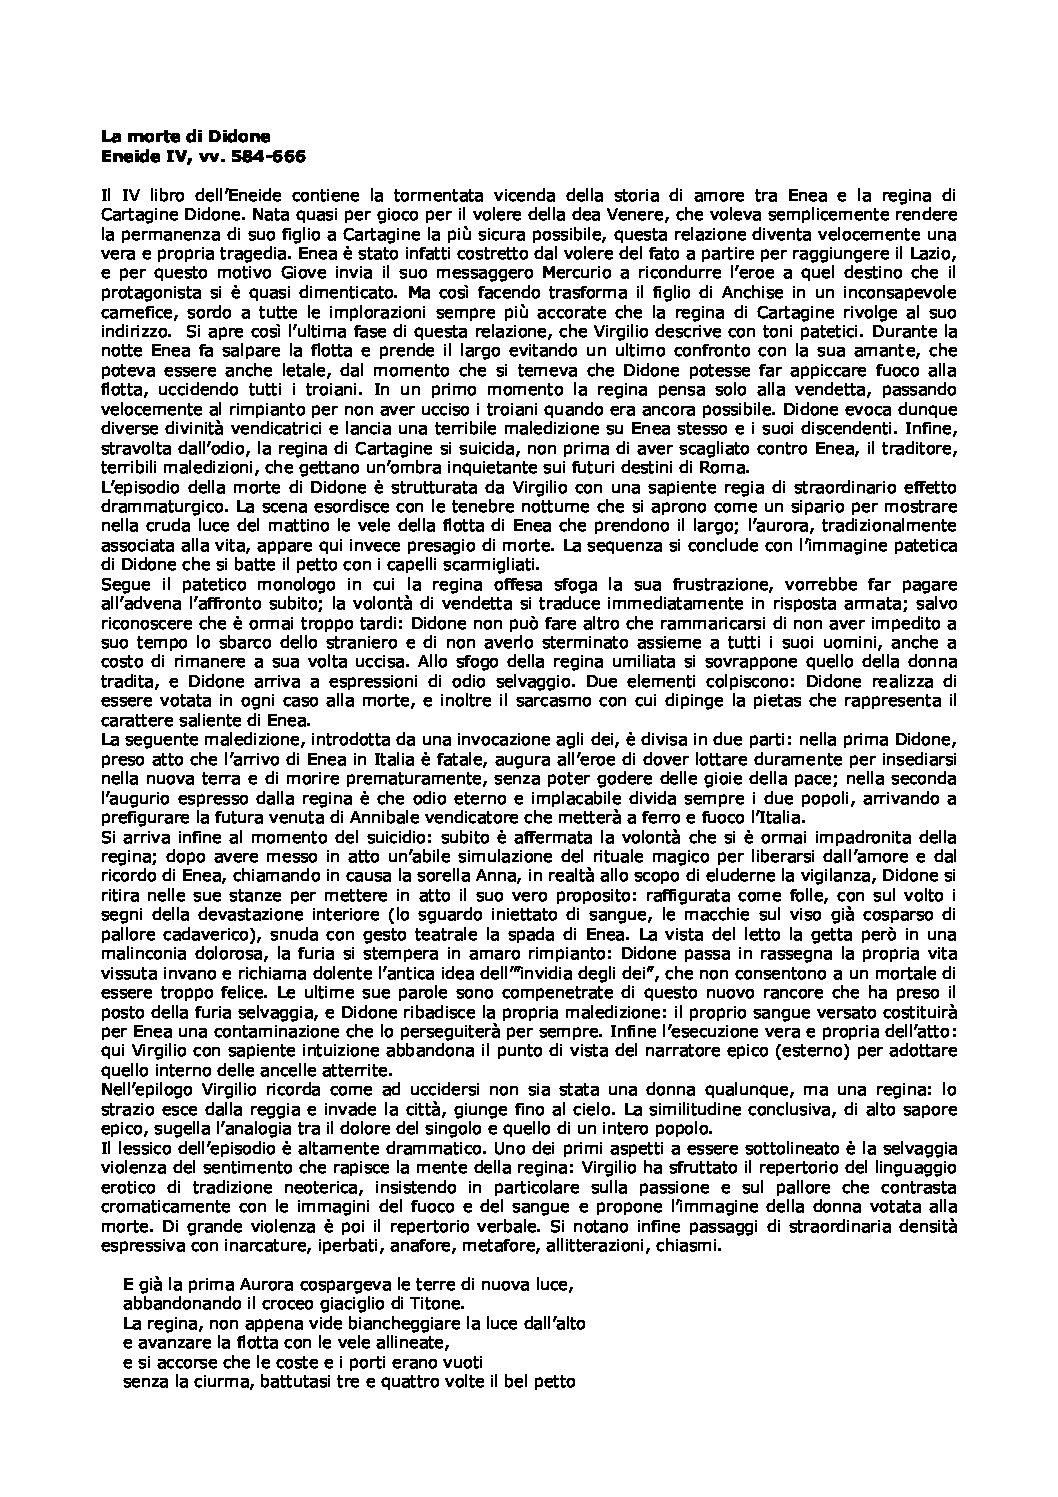 LA MORTE DI DIDONE ENEIDE IV VV 584-666 PDF